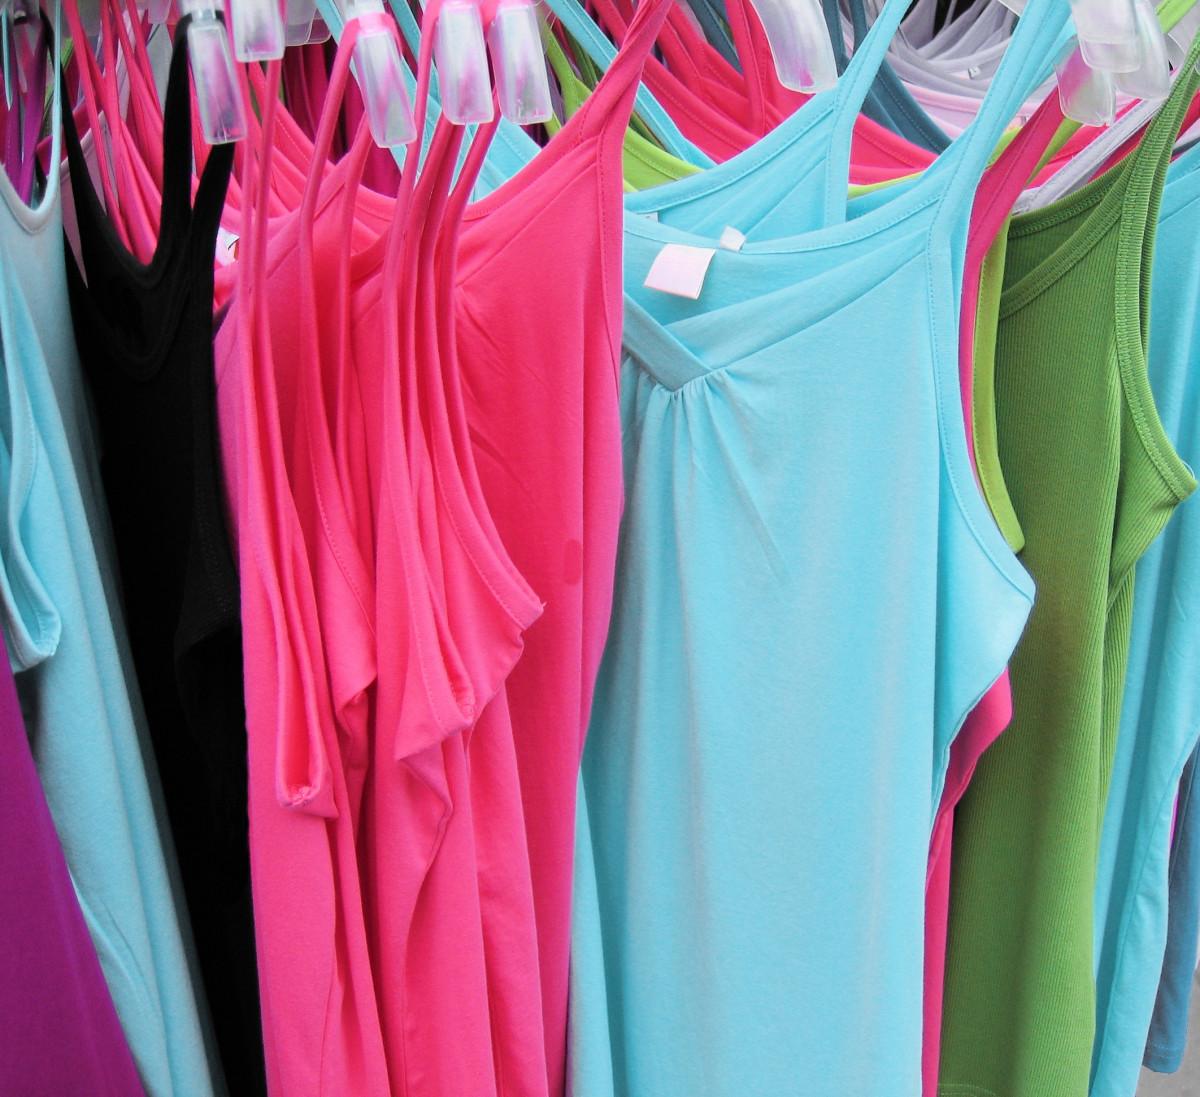 Mending life's tattered dress: a poem